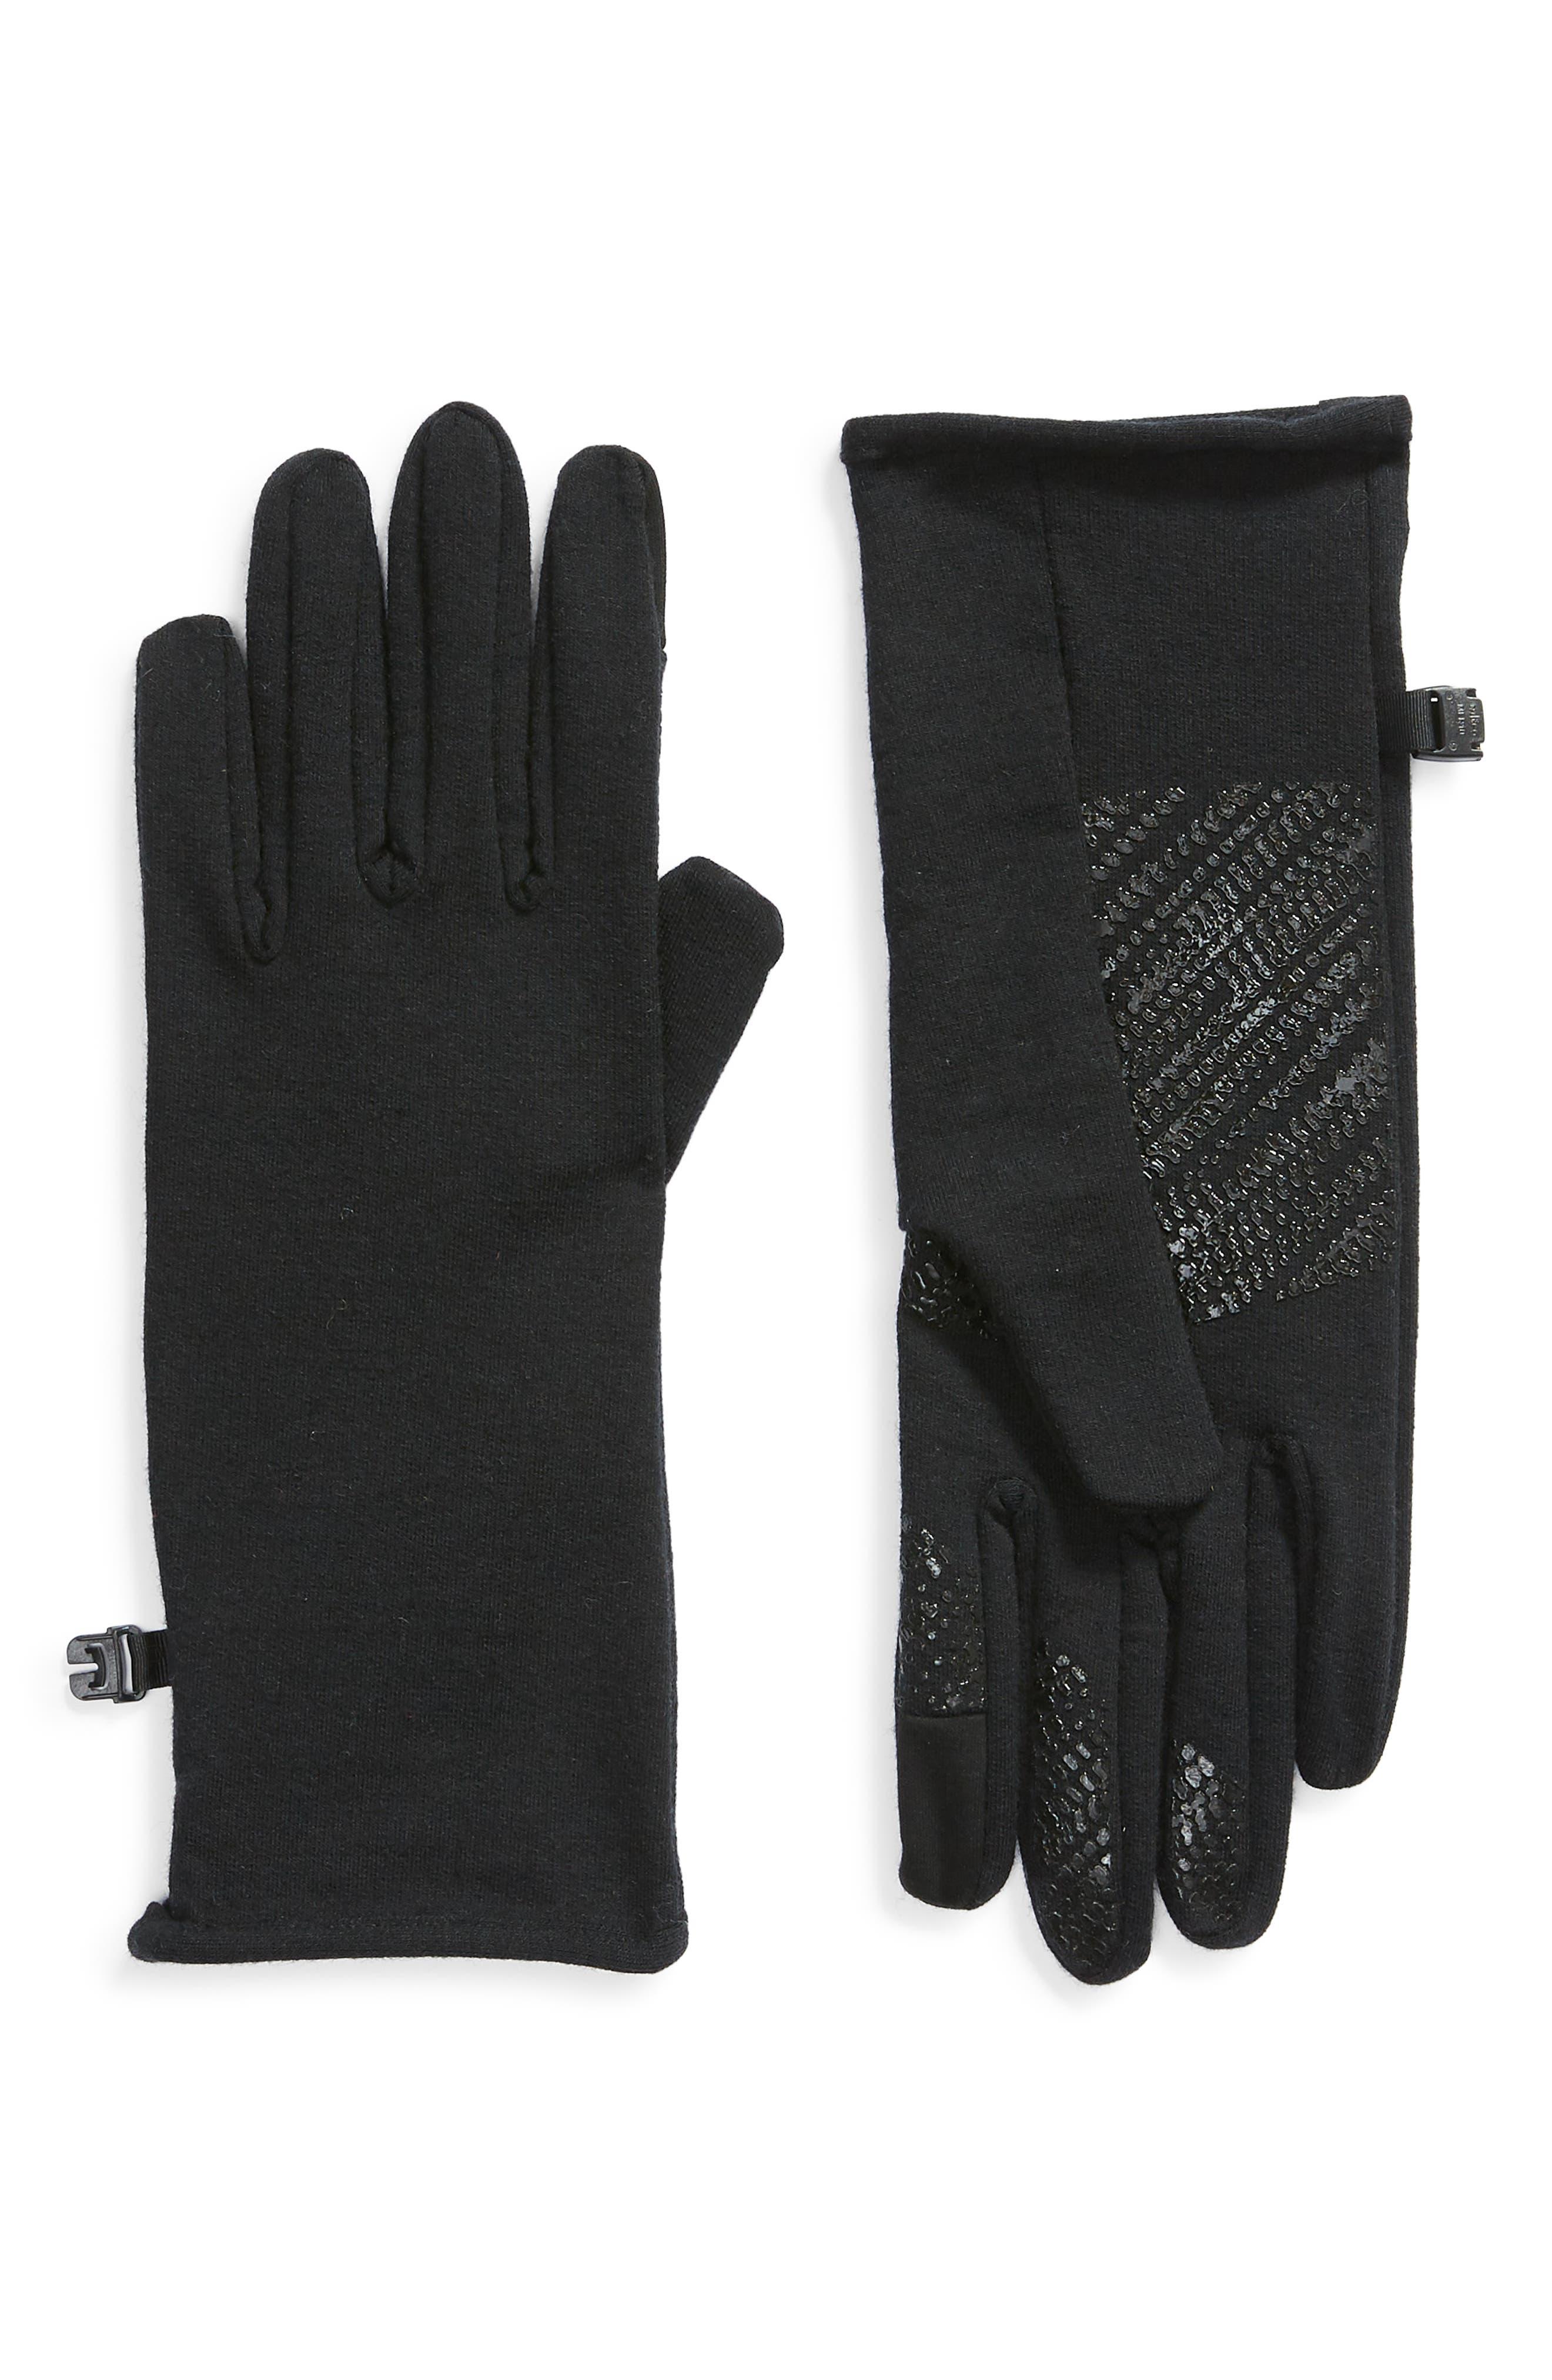 Icebreaker Unisex-Erwachsene Merino Quantum Handschuh